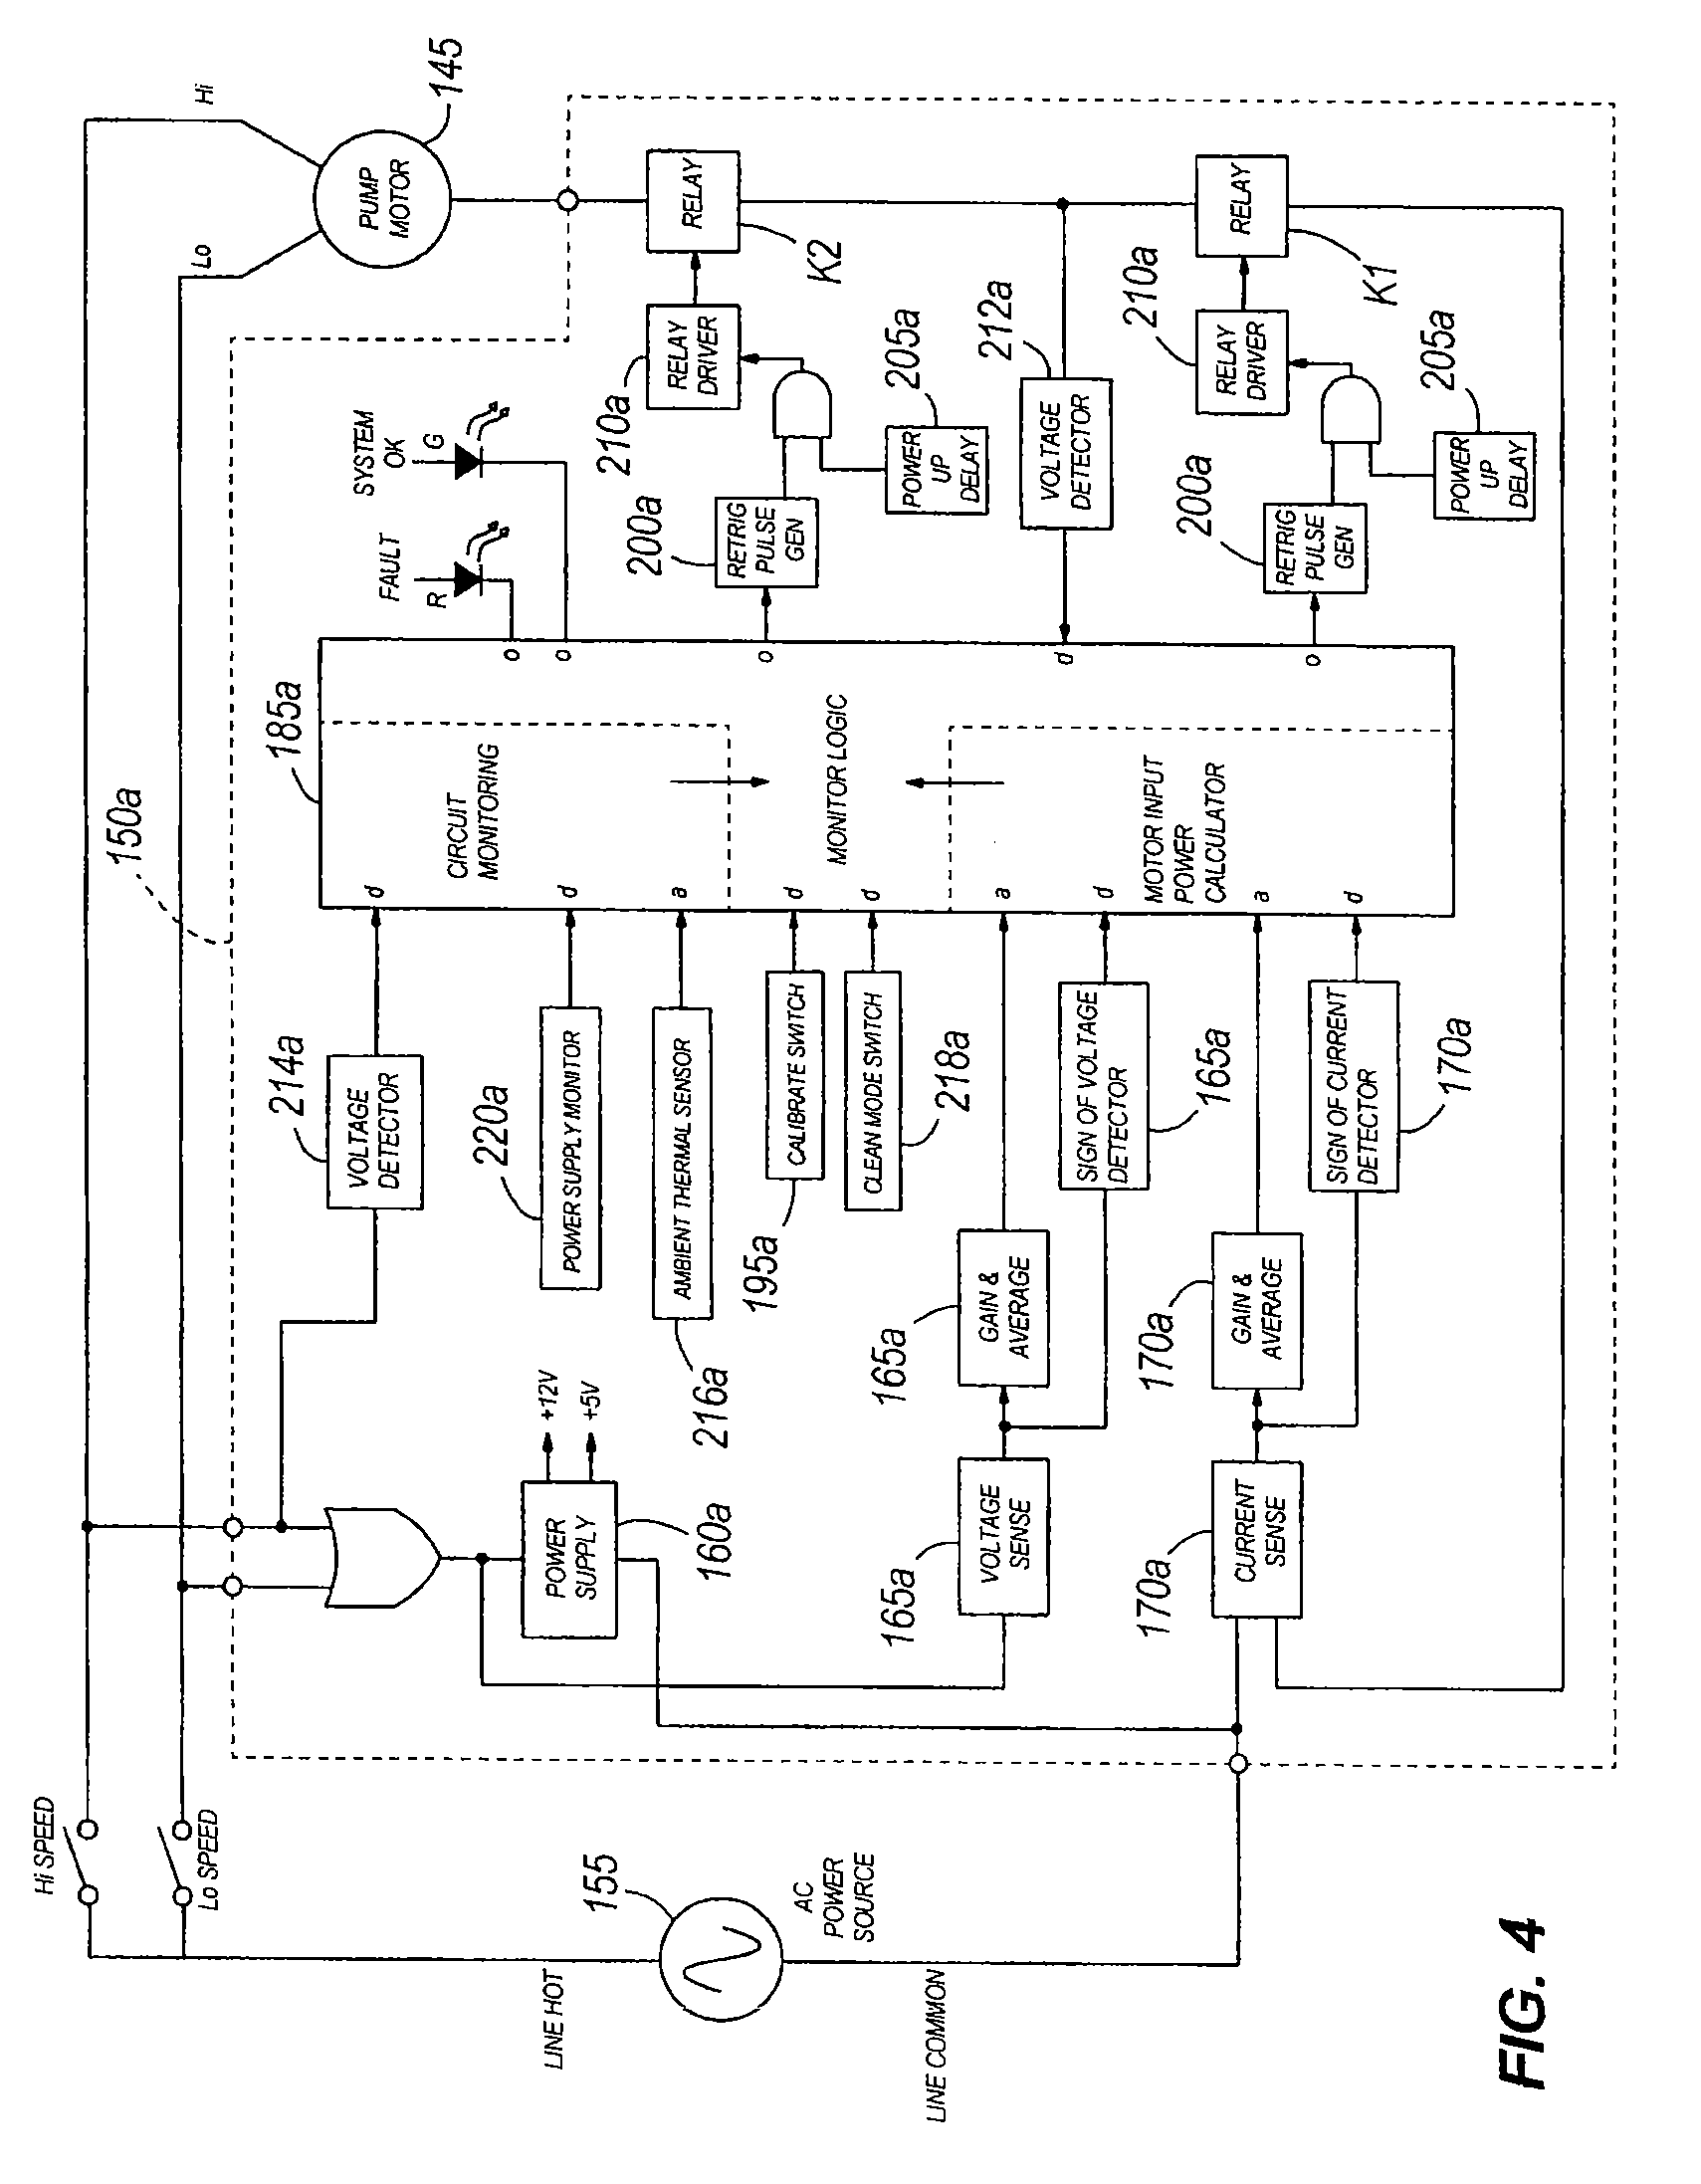 Circuit Diagram Contactor Relay Transfer Switch Wiring Diagrams - Relay circuit diagram design